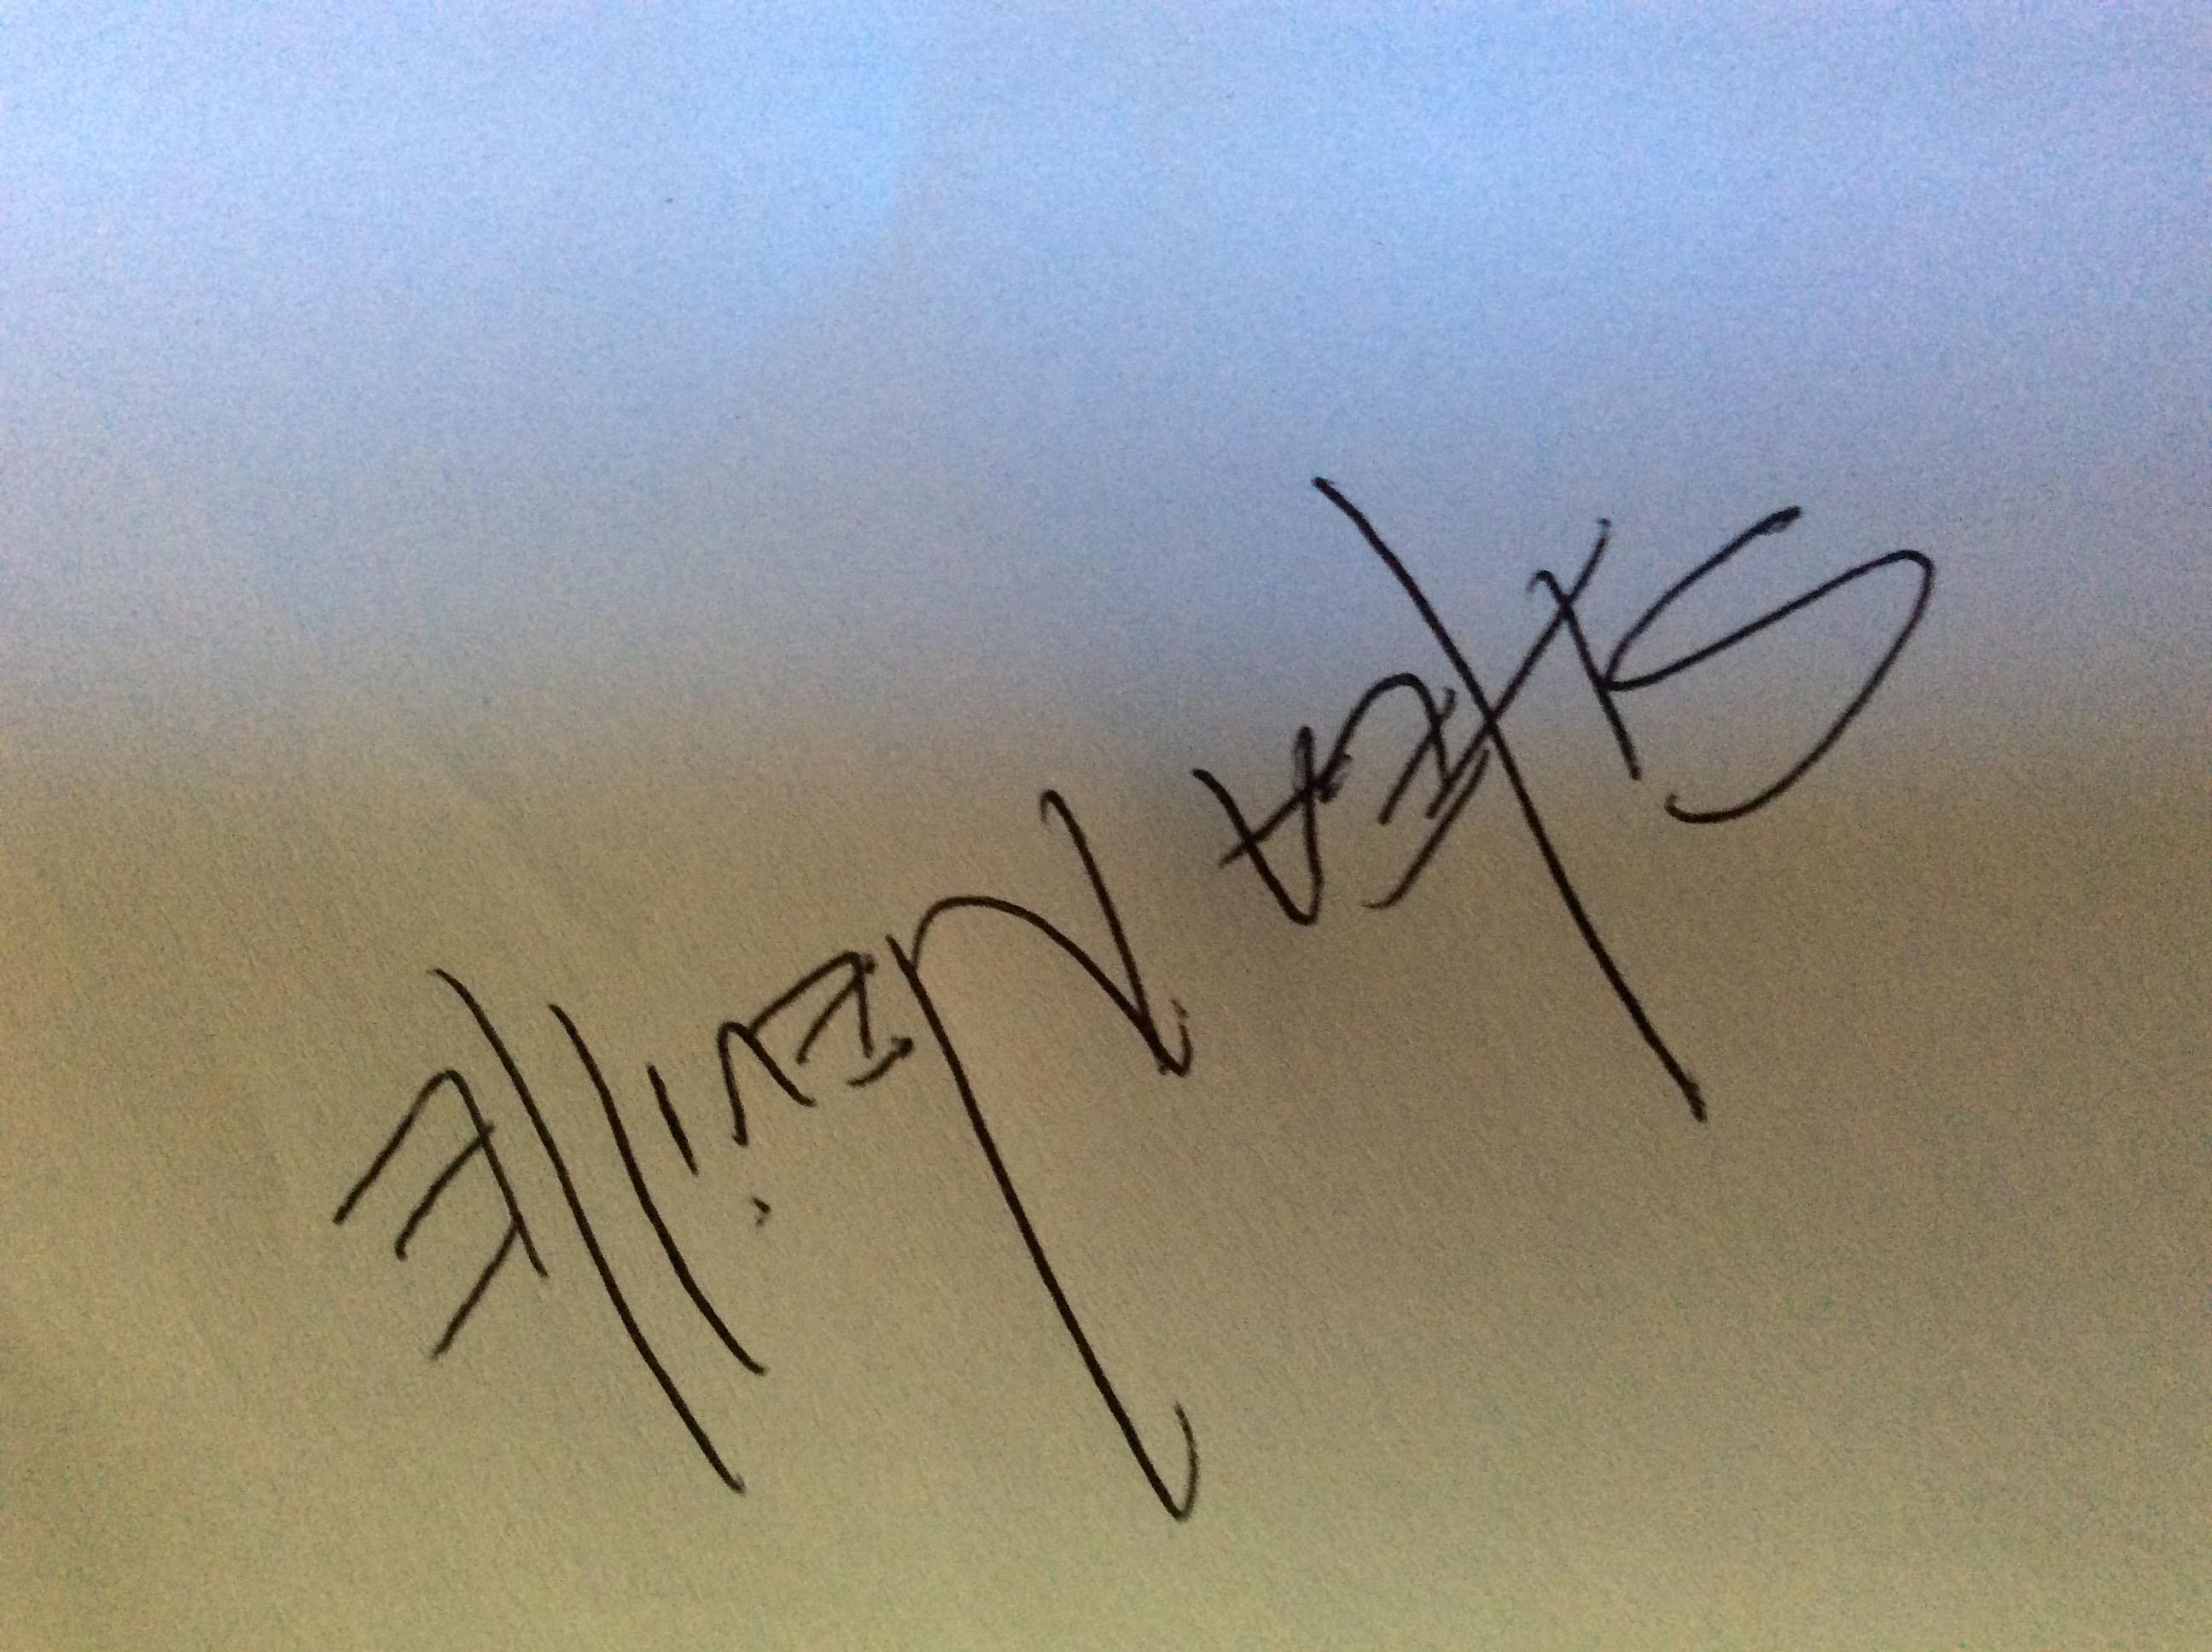 Shea Neville Signature